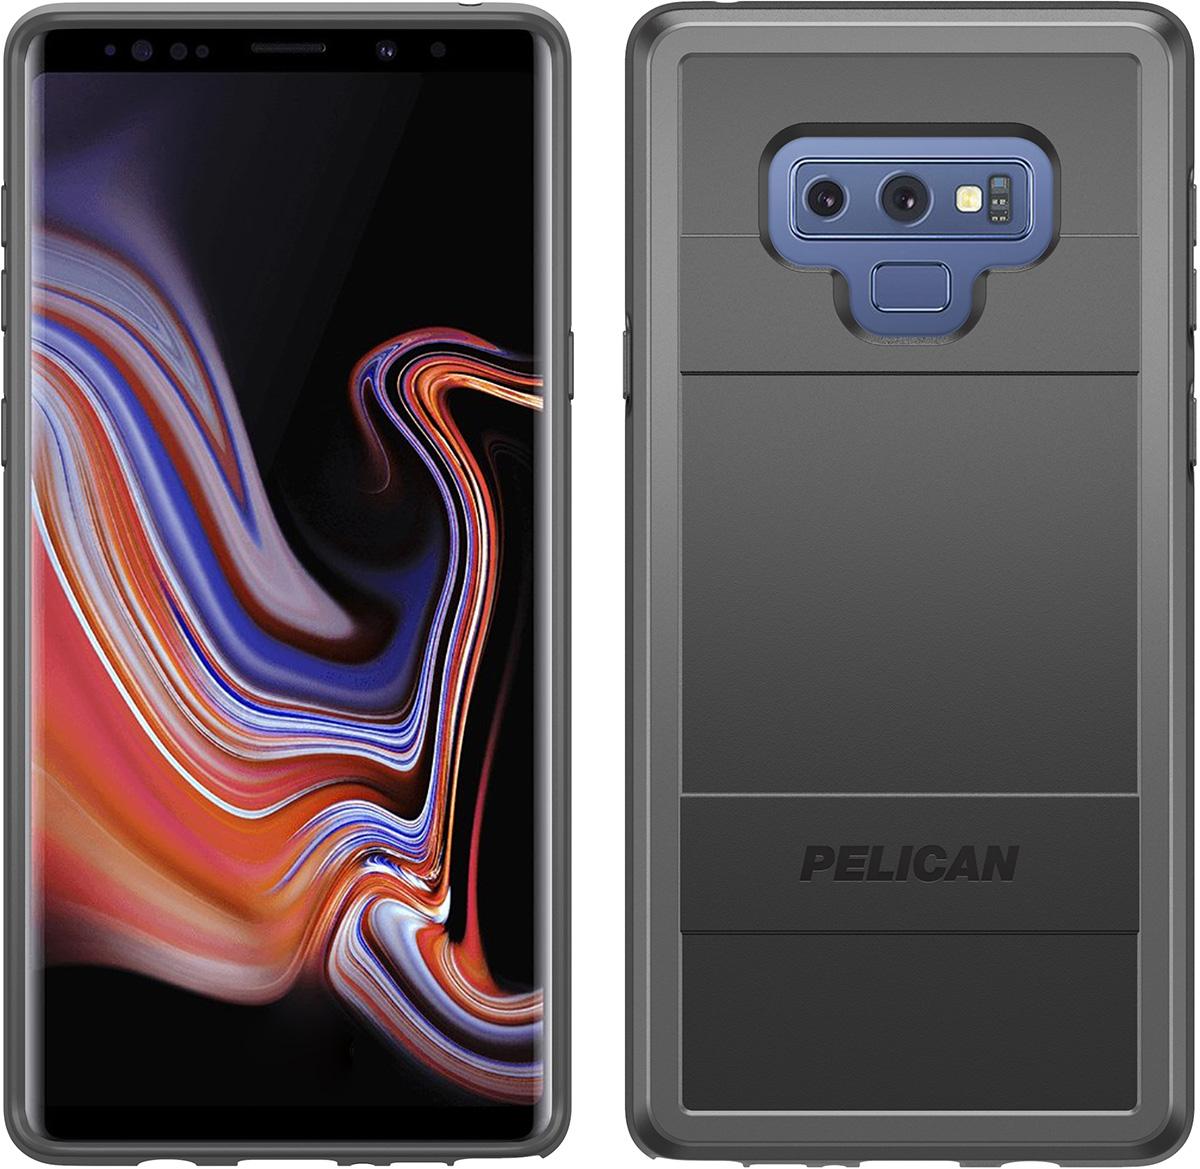 pelican samsung note9 protector phone case